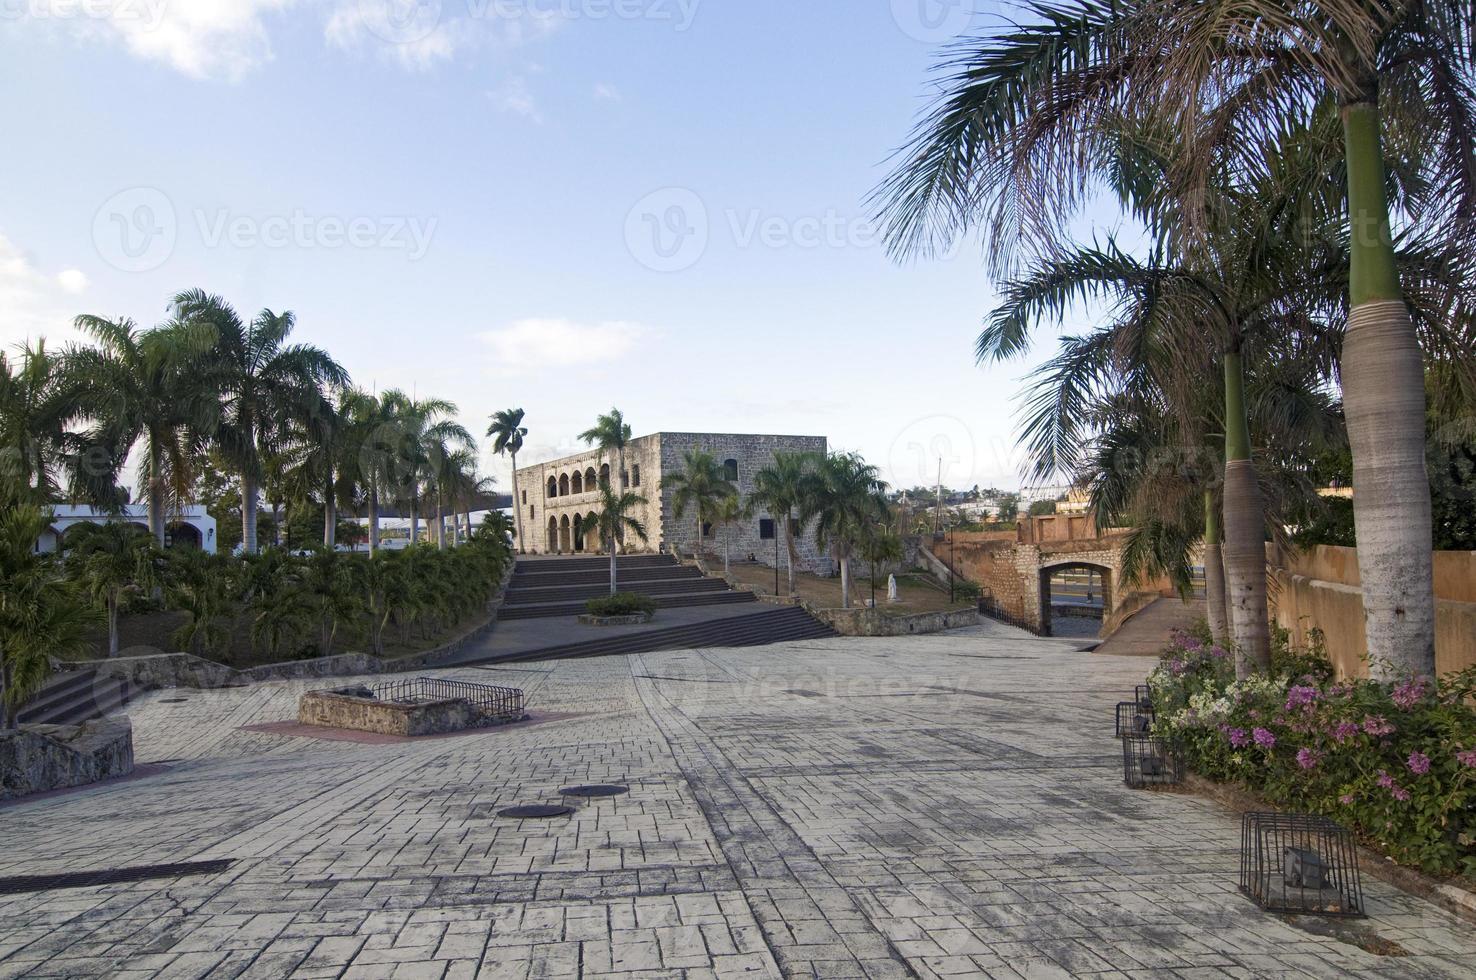 Alcazar de Colon, Dominikanische Republik. foto